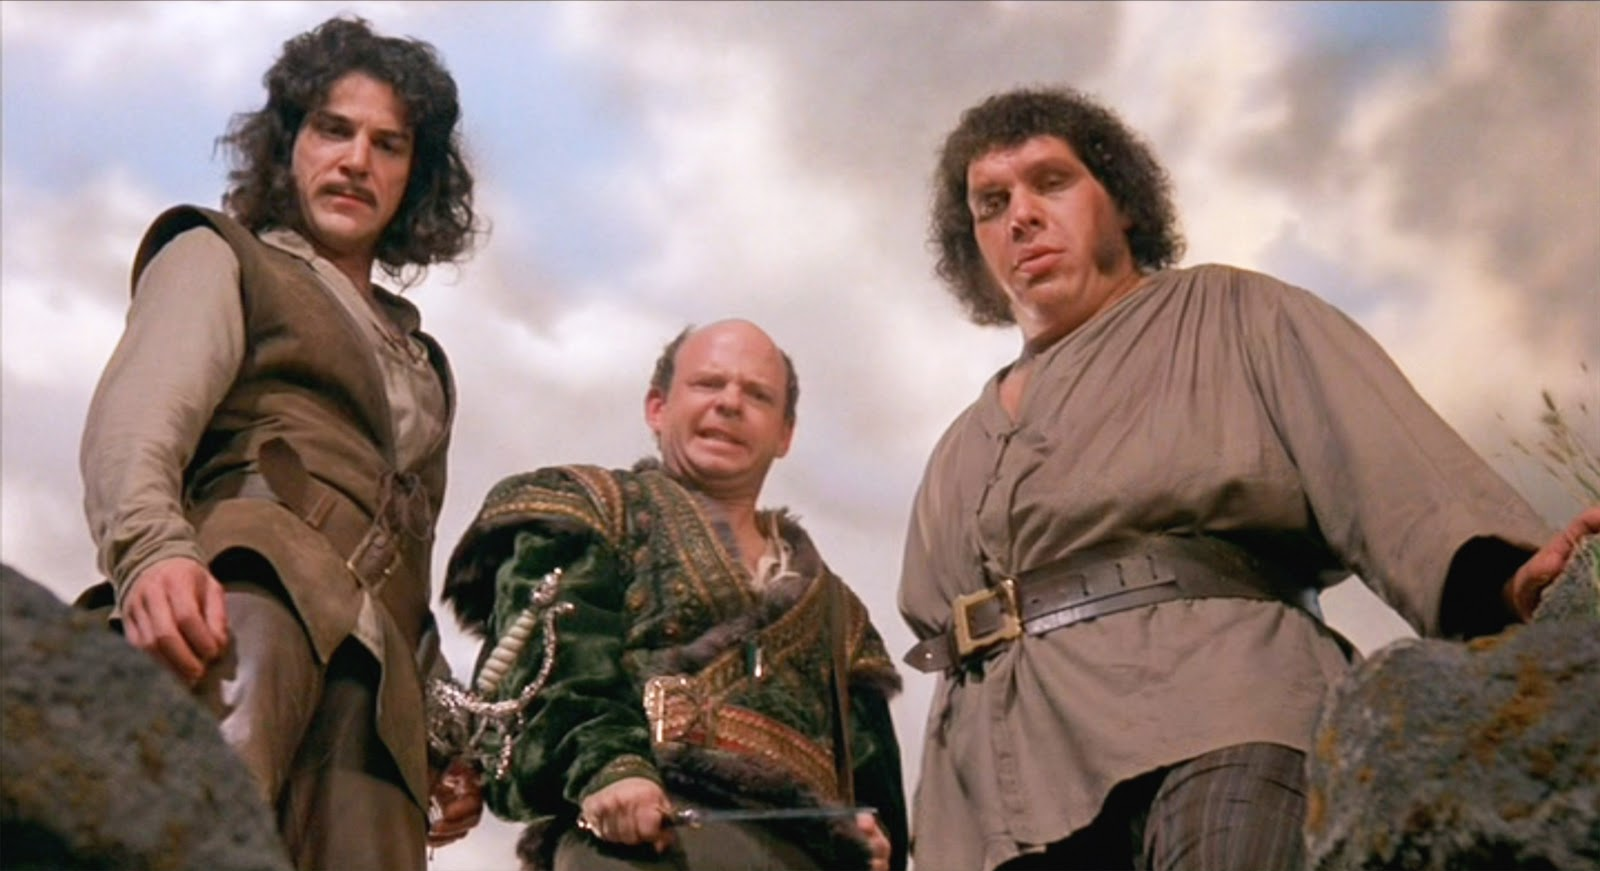 Inigo Montoya, Vizzini, and Fezzik looking over the Cliffs of Insanity!